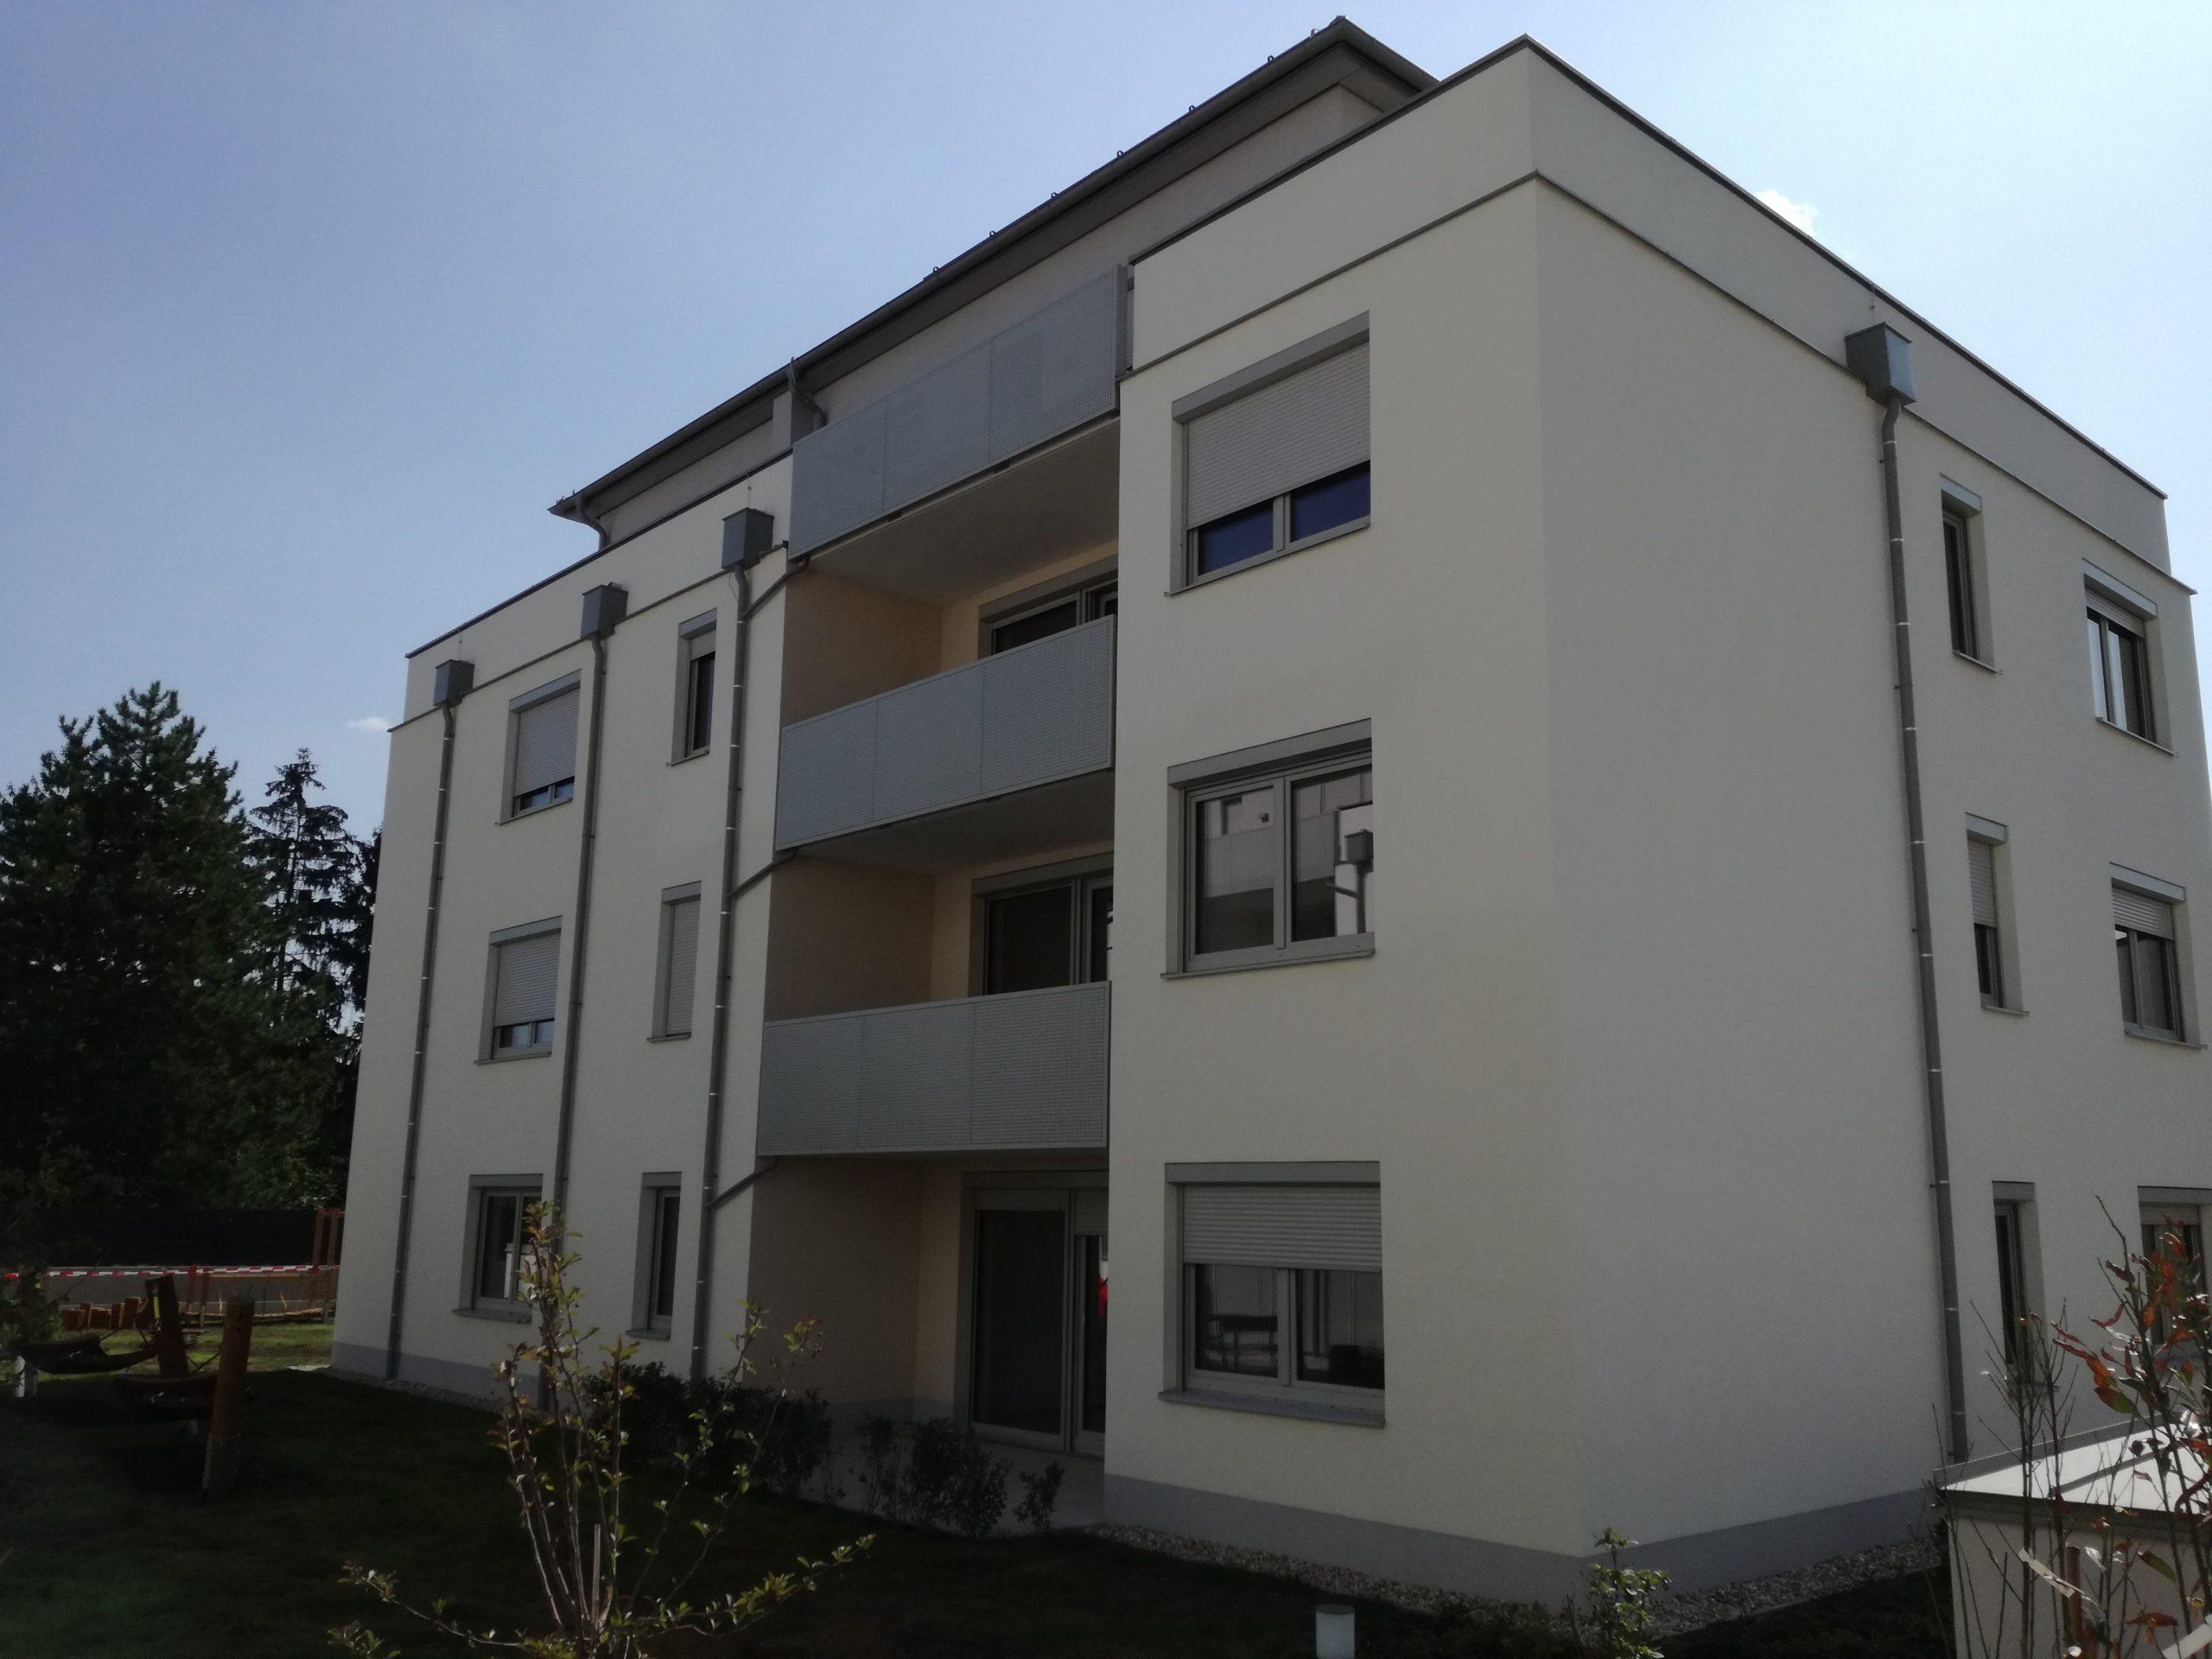 Immobilie von Kamptal in 2130 Mistelbach, Mistelbach, Mistelbach X/1 & X/2 - Top 205 #3